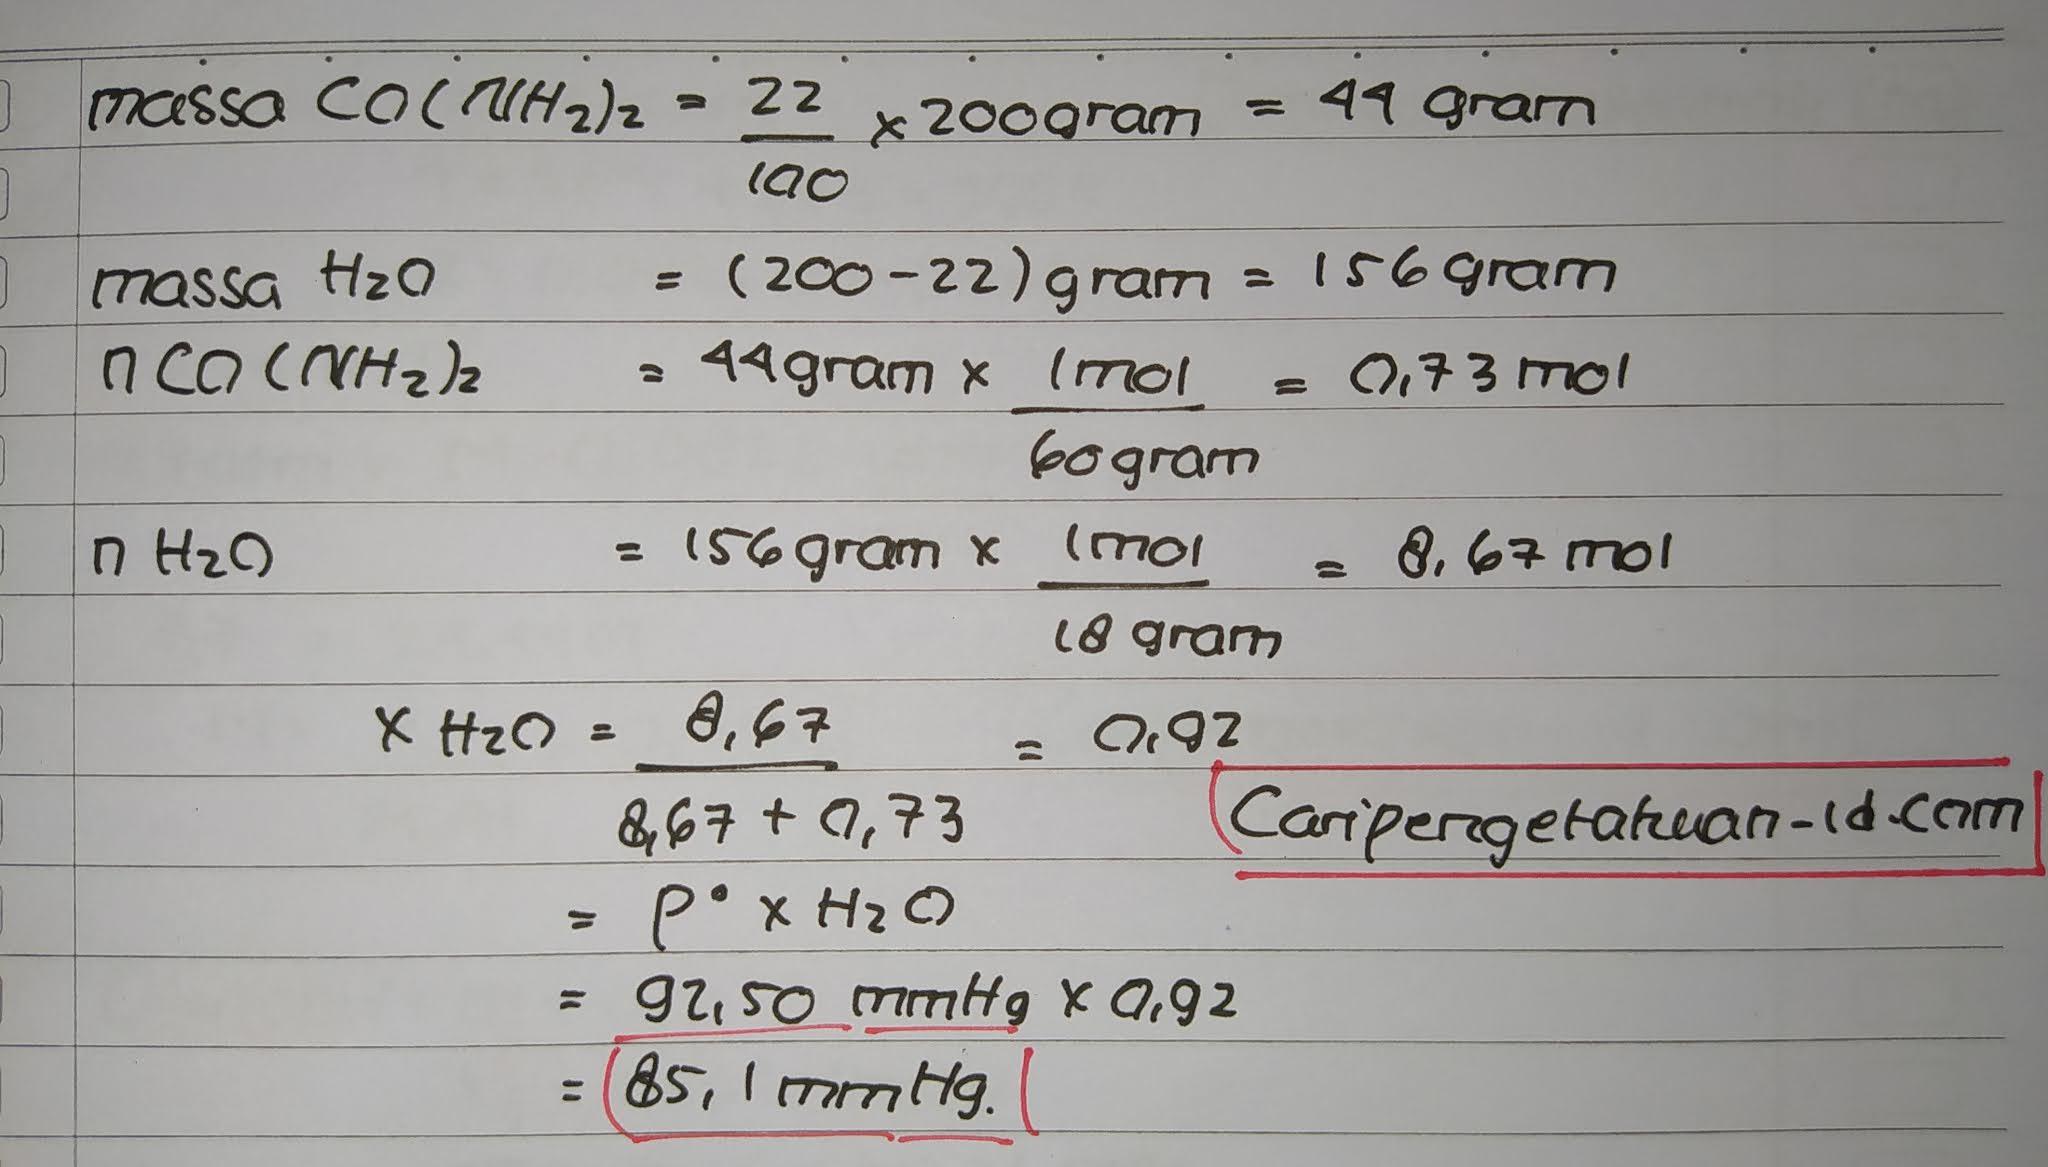 Suatu larutan yang mengandung 22% massa urea (CO(NH2)2), Jika tekanan uap jenuh air pada temperatur adalah 92.50 mmHg dan massa larutan 200 gram. Maka tekanan uap jenuh larutan tersebut adalah